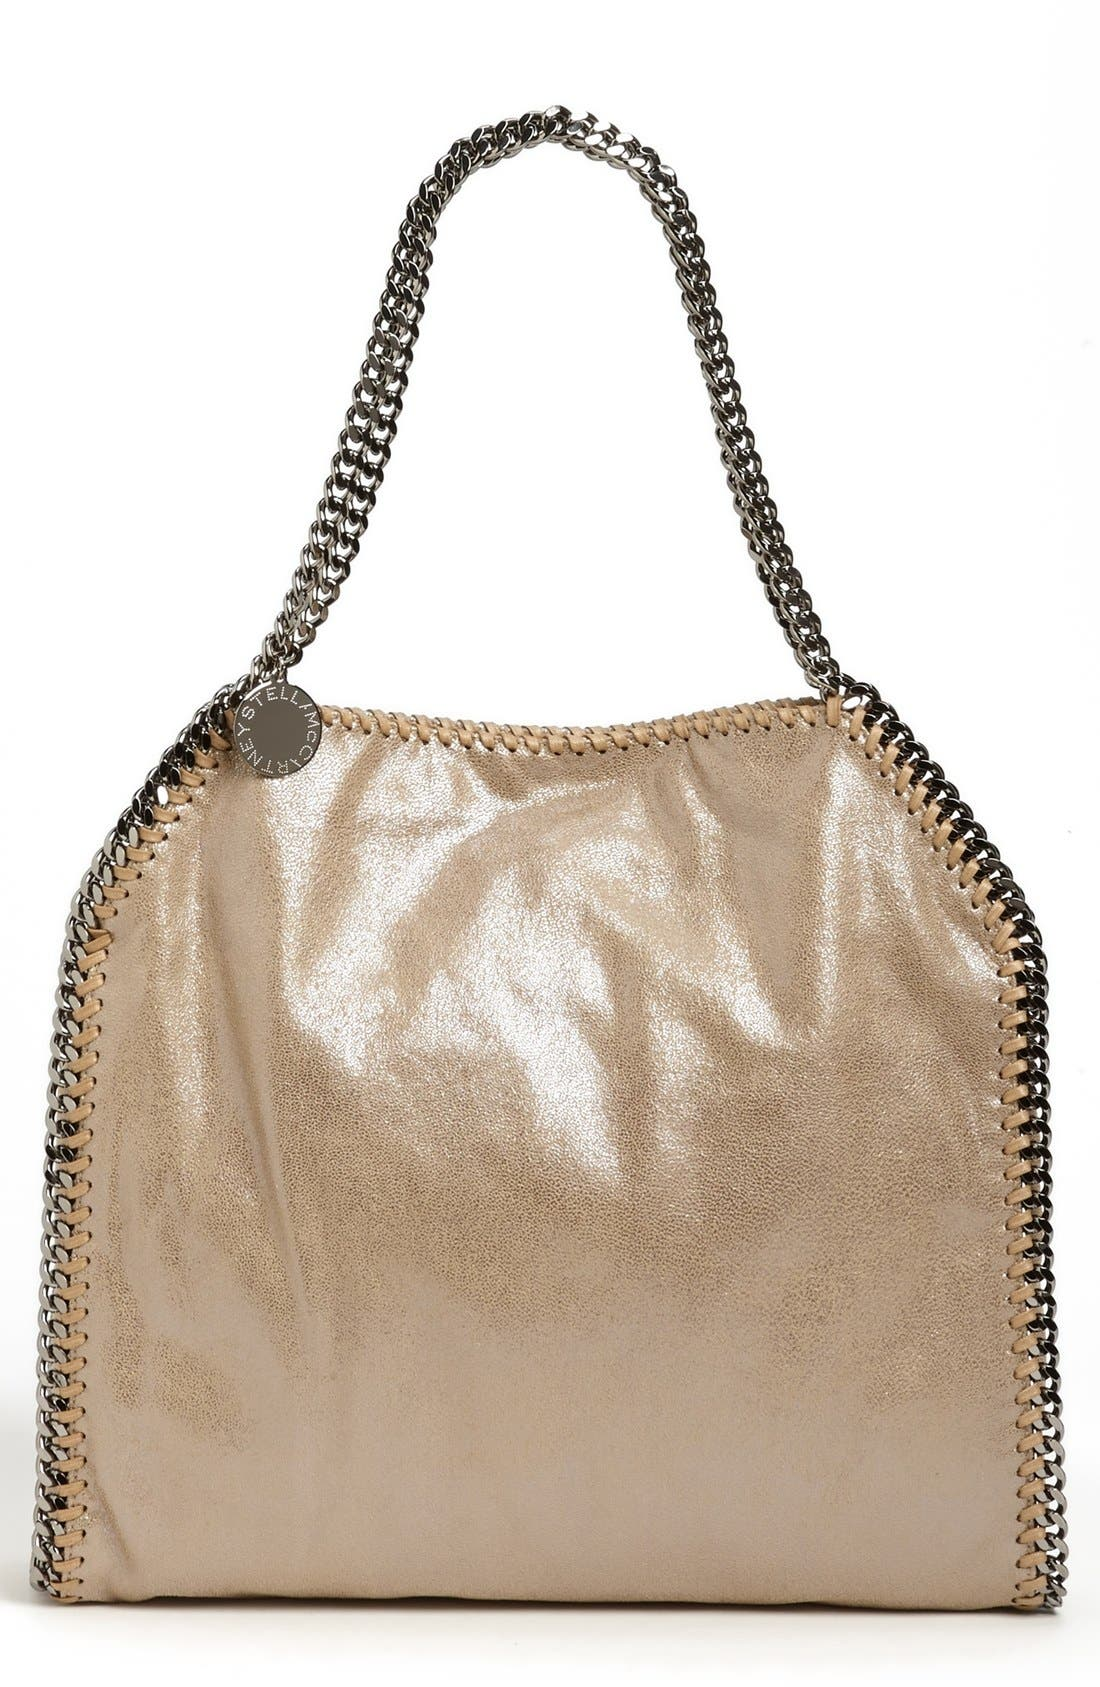 Main Image - Stella McCartney 'Small Falabella' Faux Leather Tote